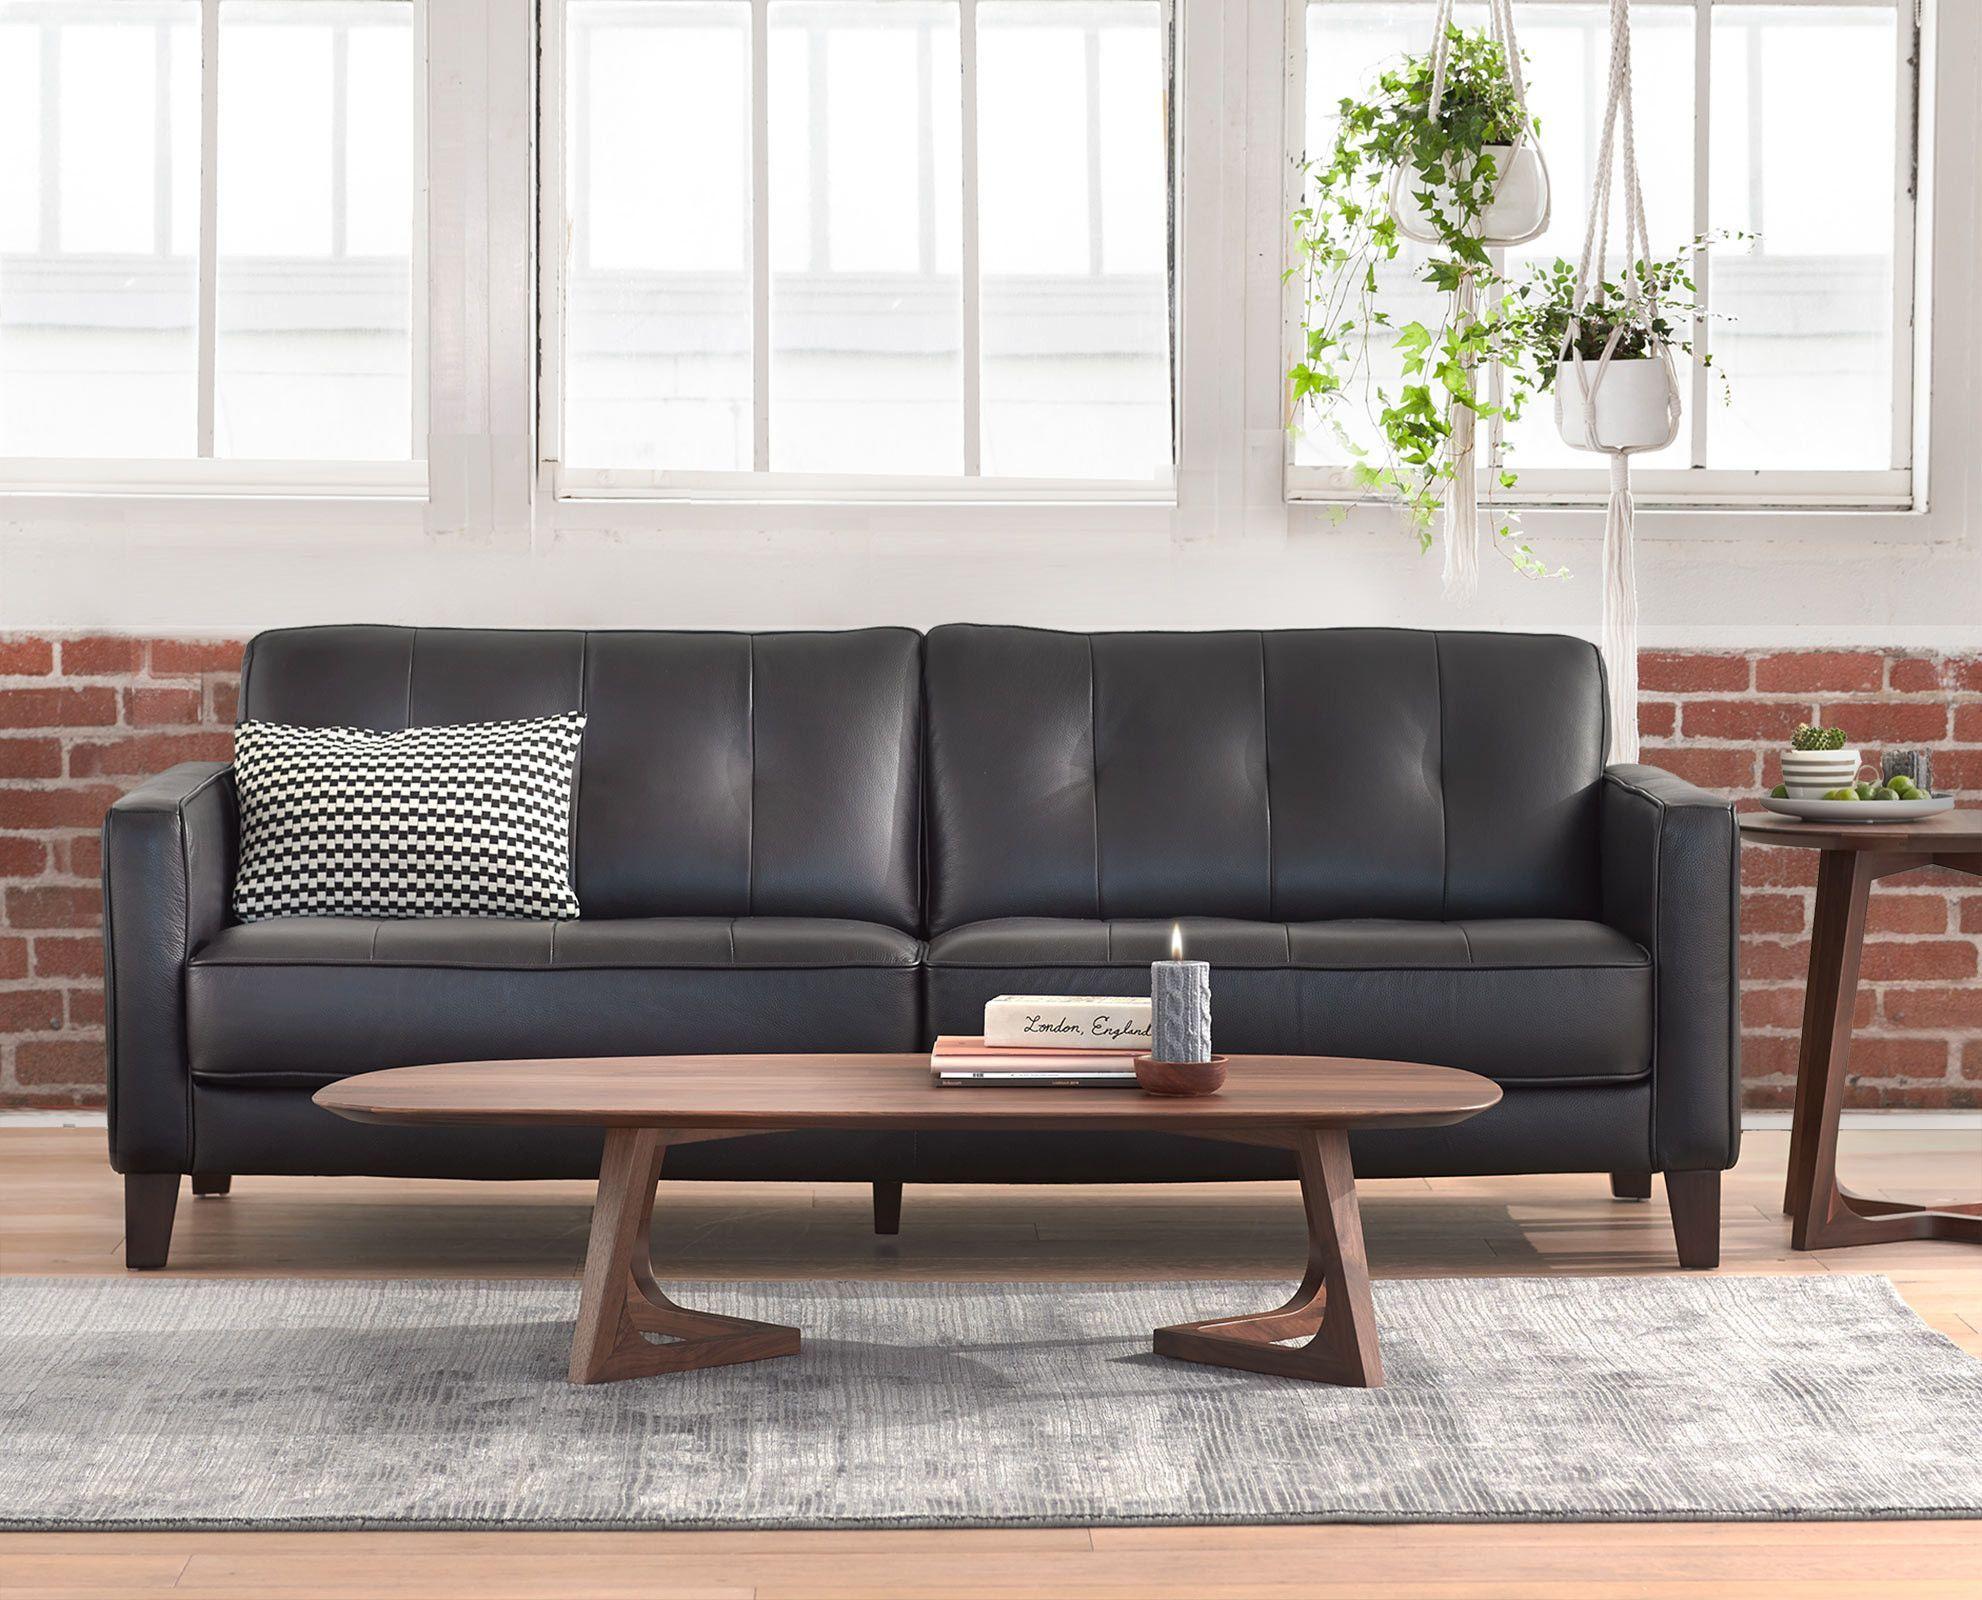 clean modern lines define the gregata leather sofa featuring a row rh pinterest com